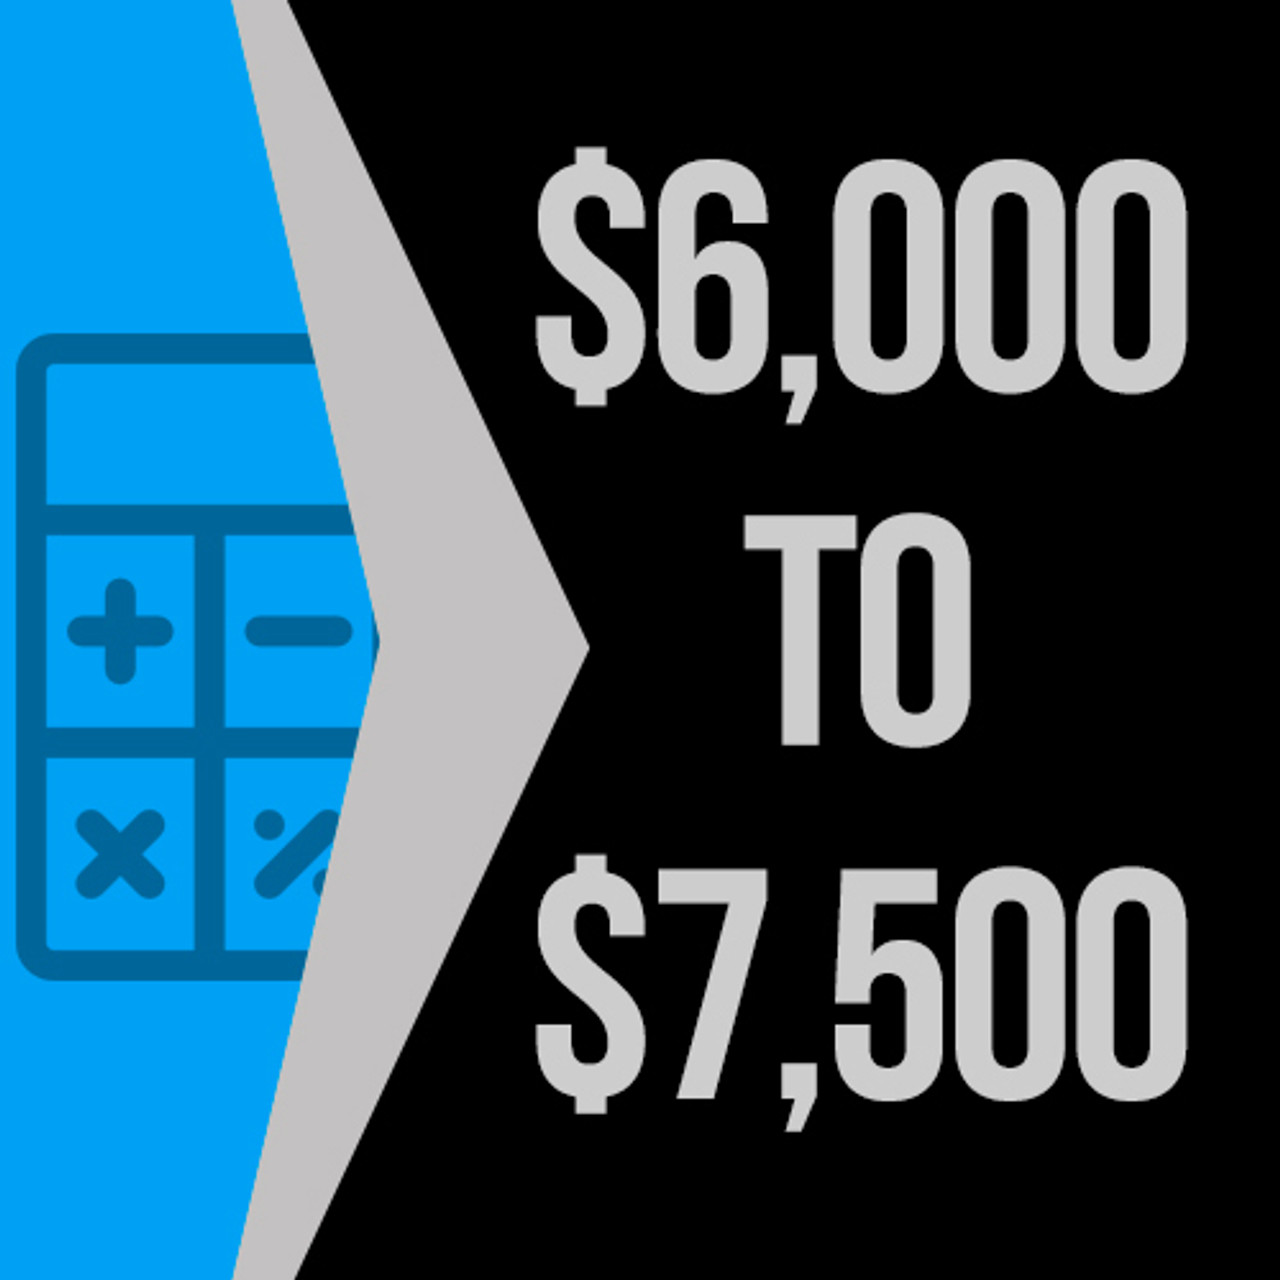 $6000 to $7500